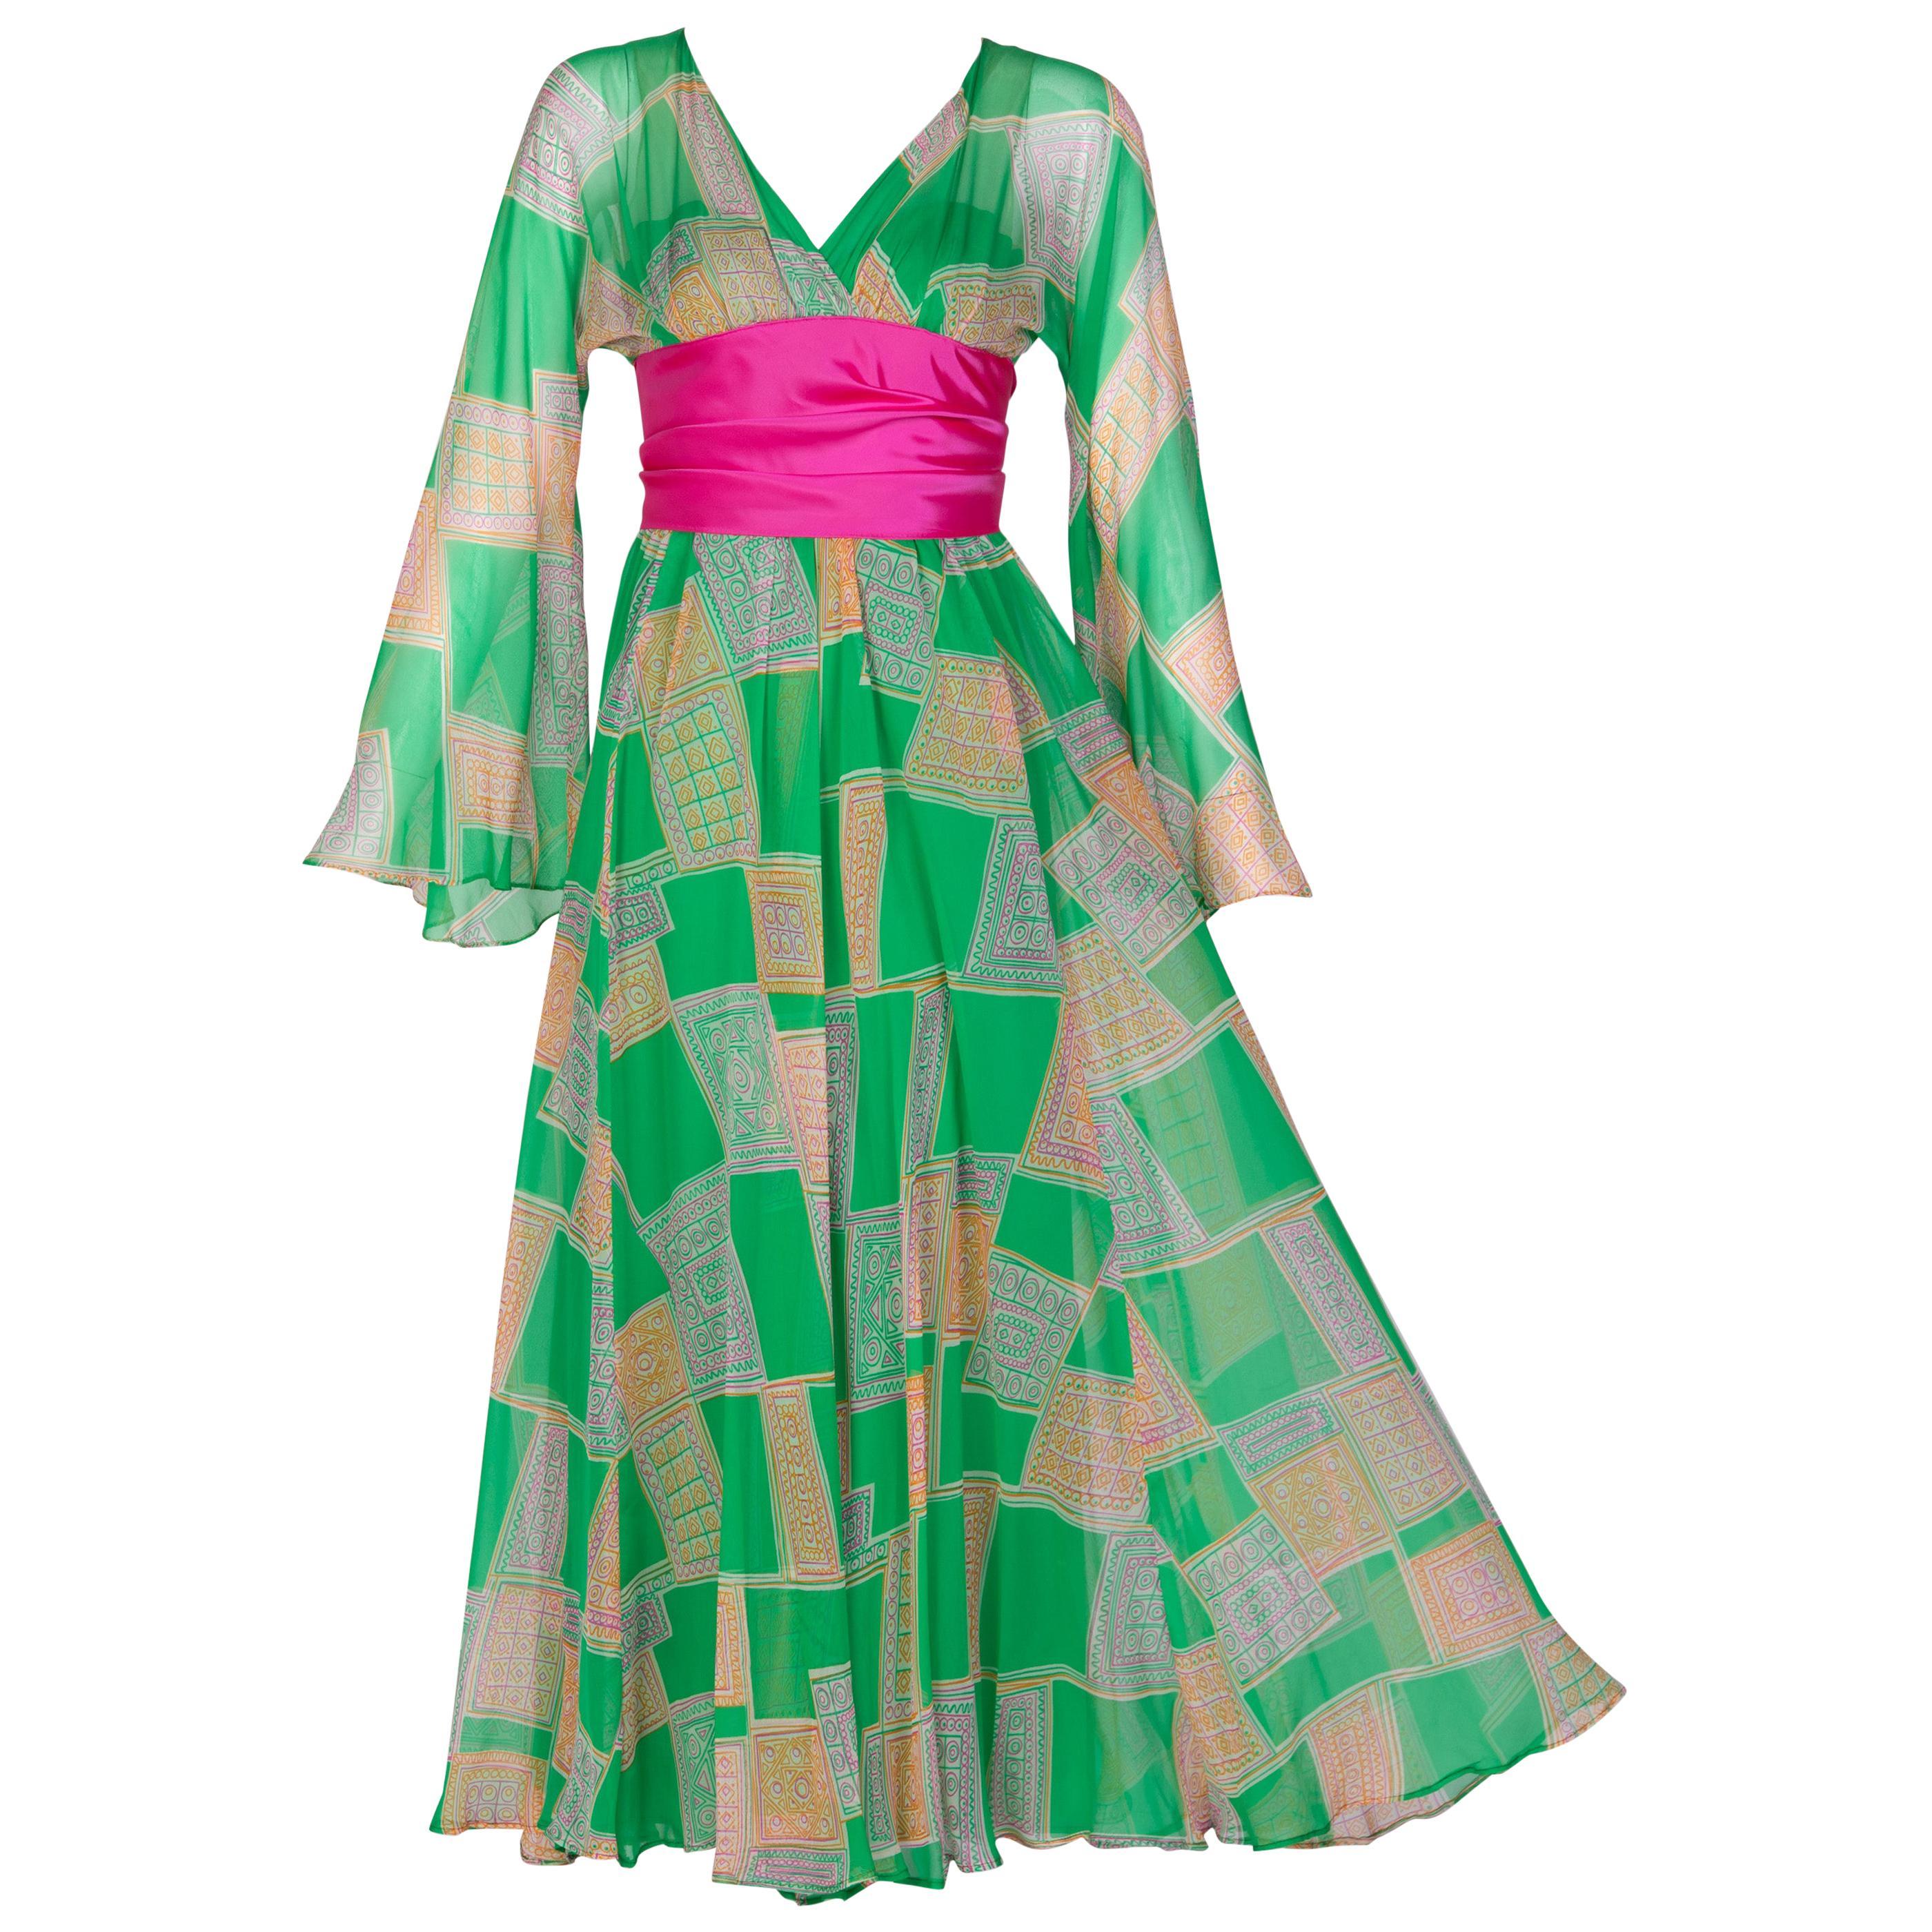 Malcolm Starr Green Geometric Print Chiffon Pink Sash Dress, 1960s